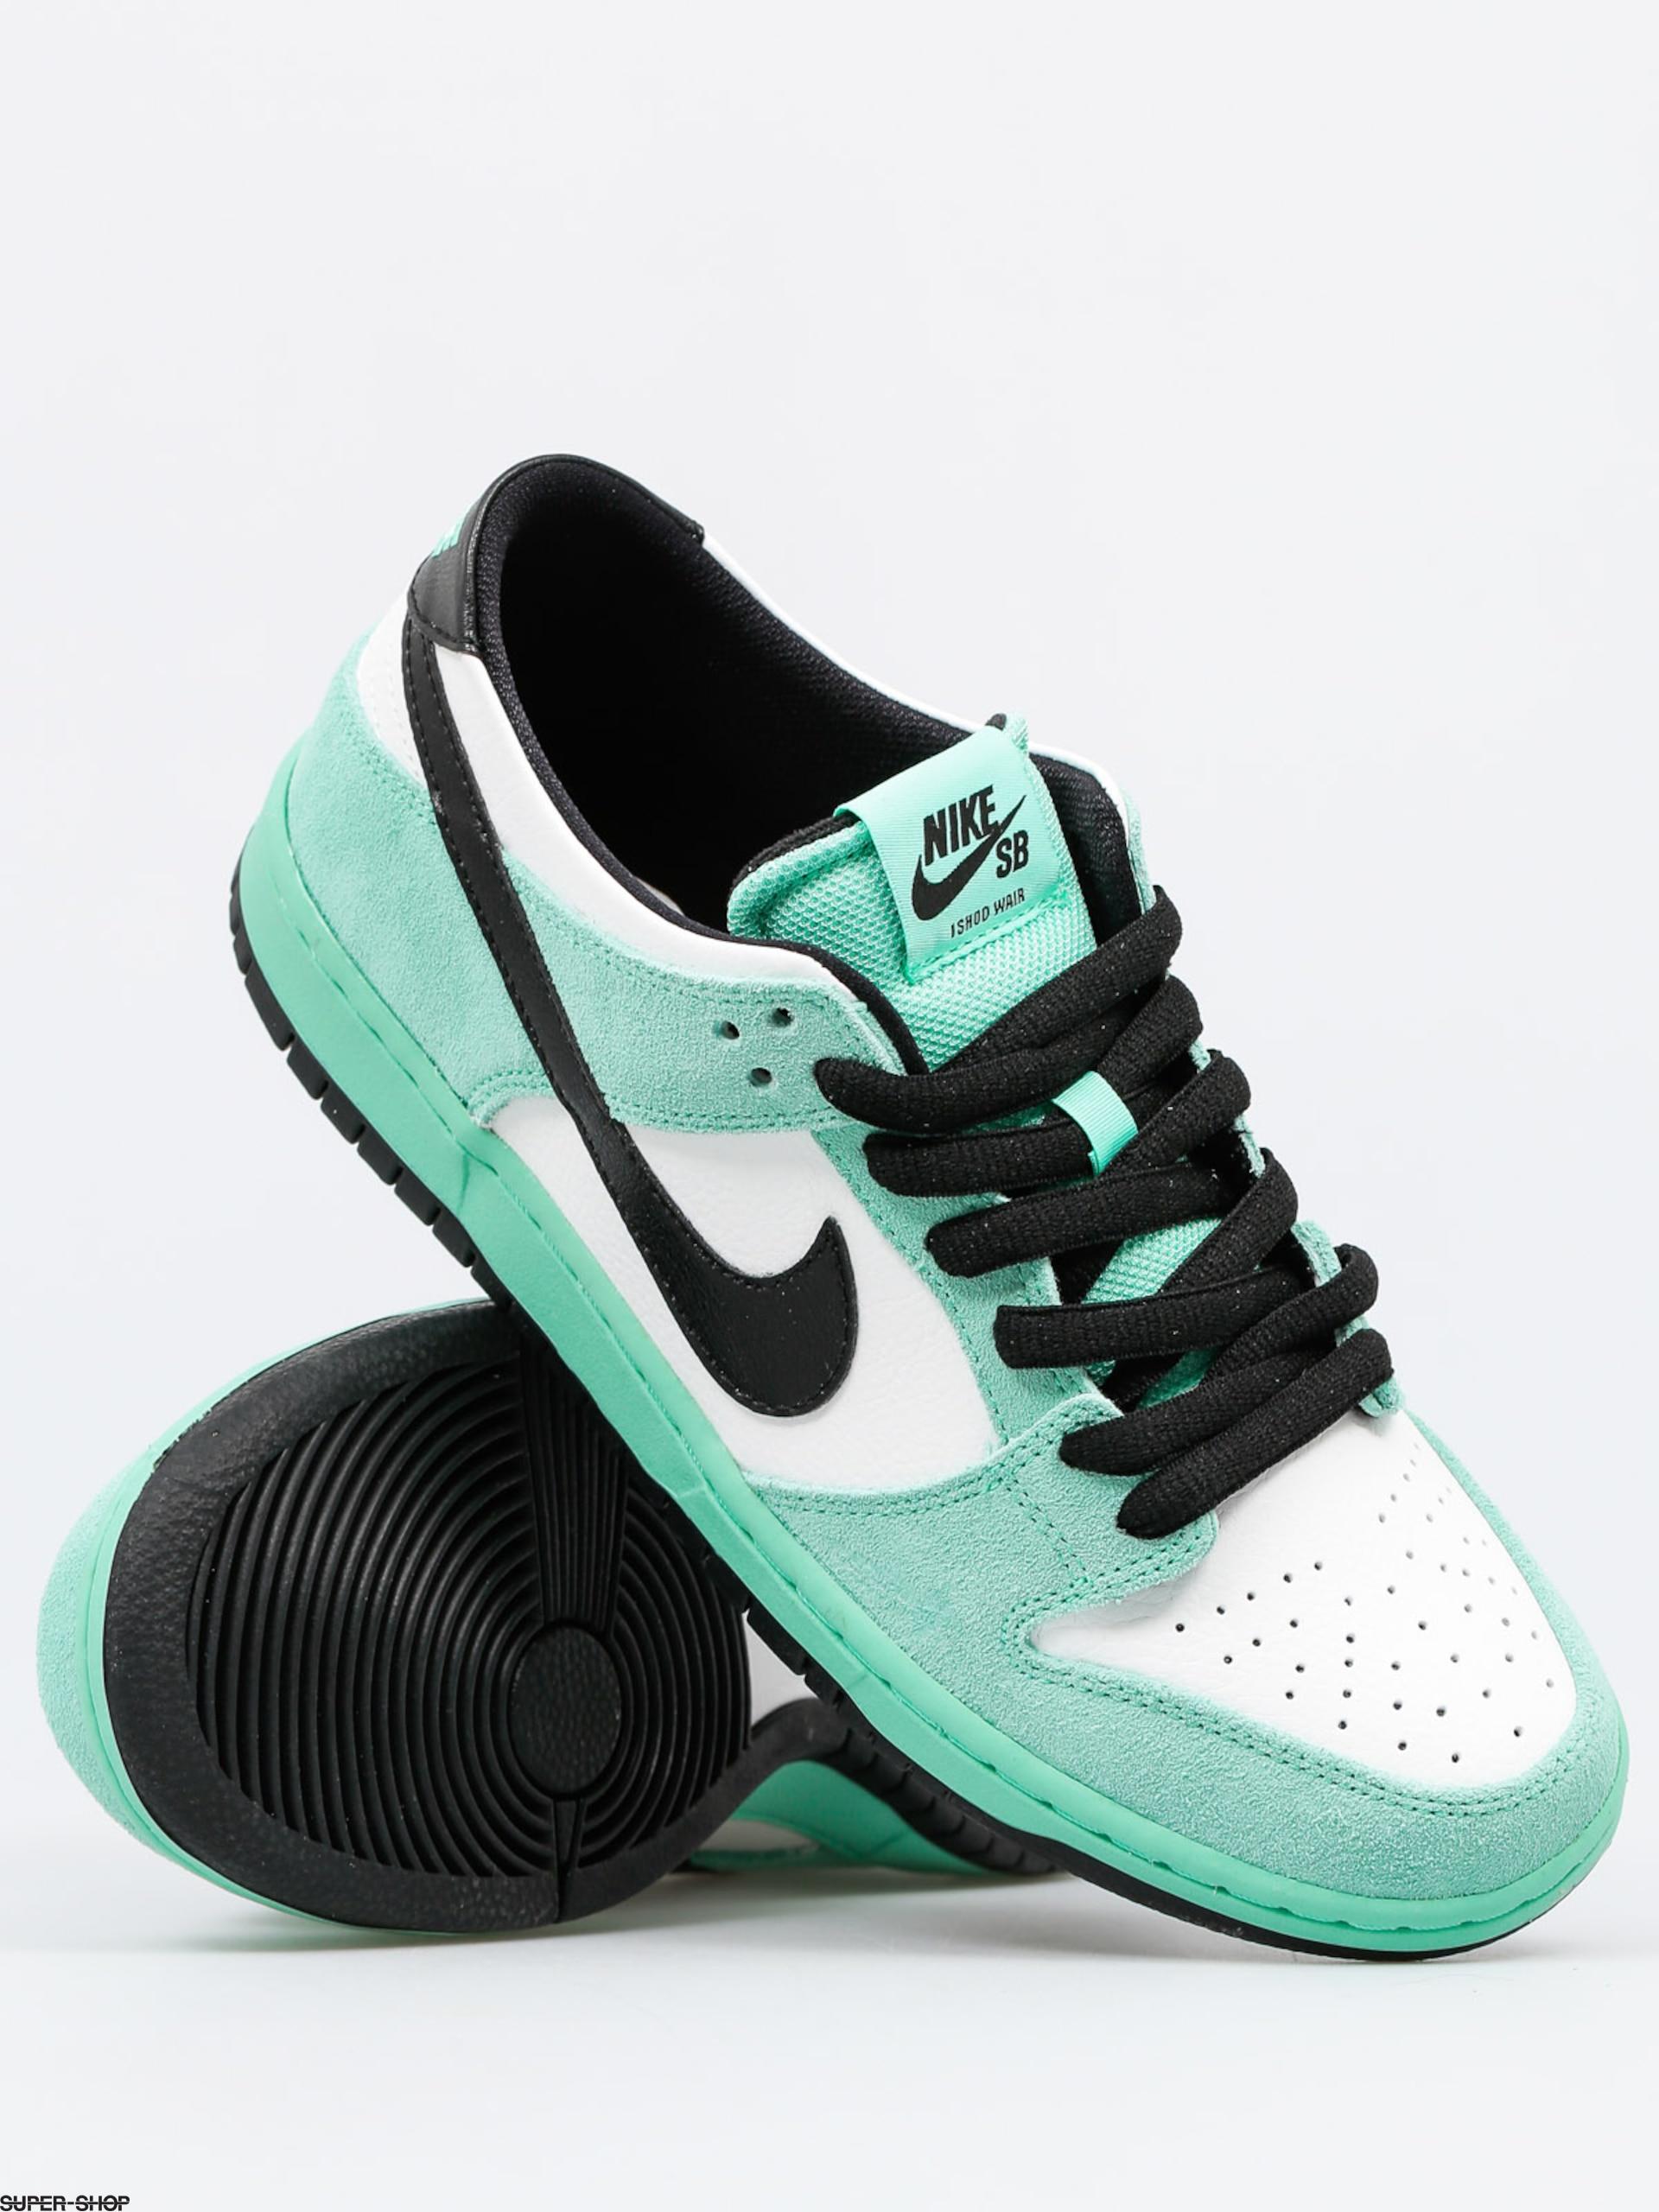 best service 21723 e8697 Nike SB Shoes Dunk Low Pro Iw (green glow black summit white)